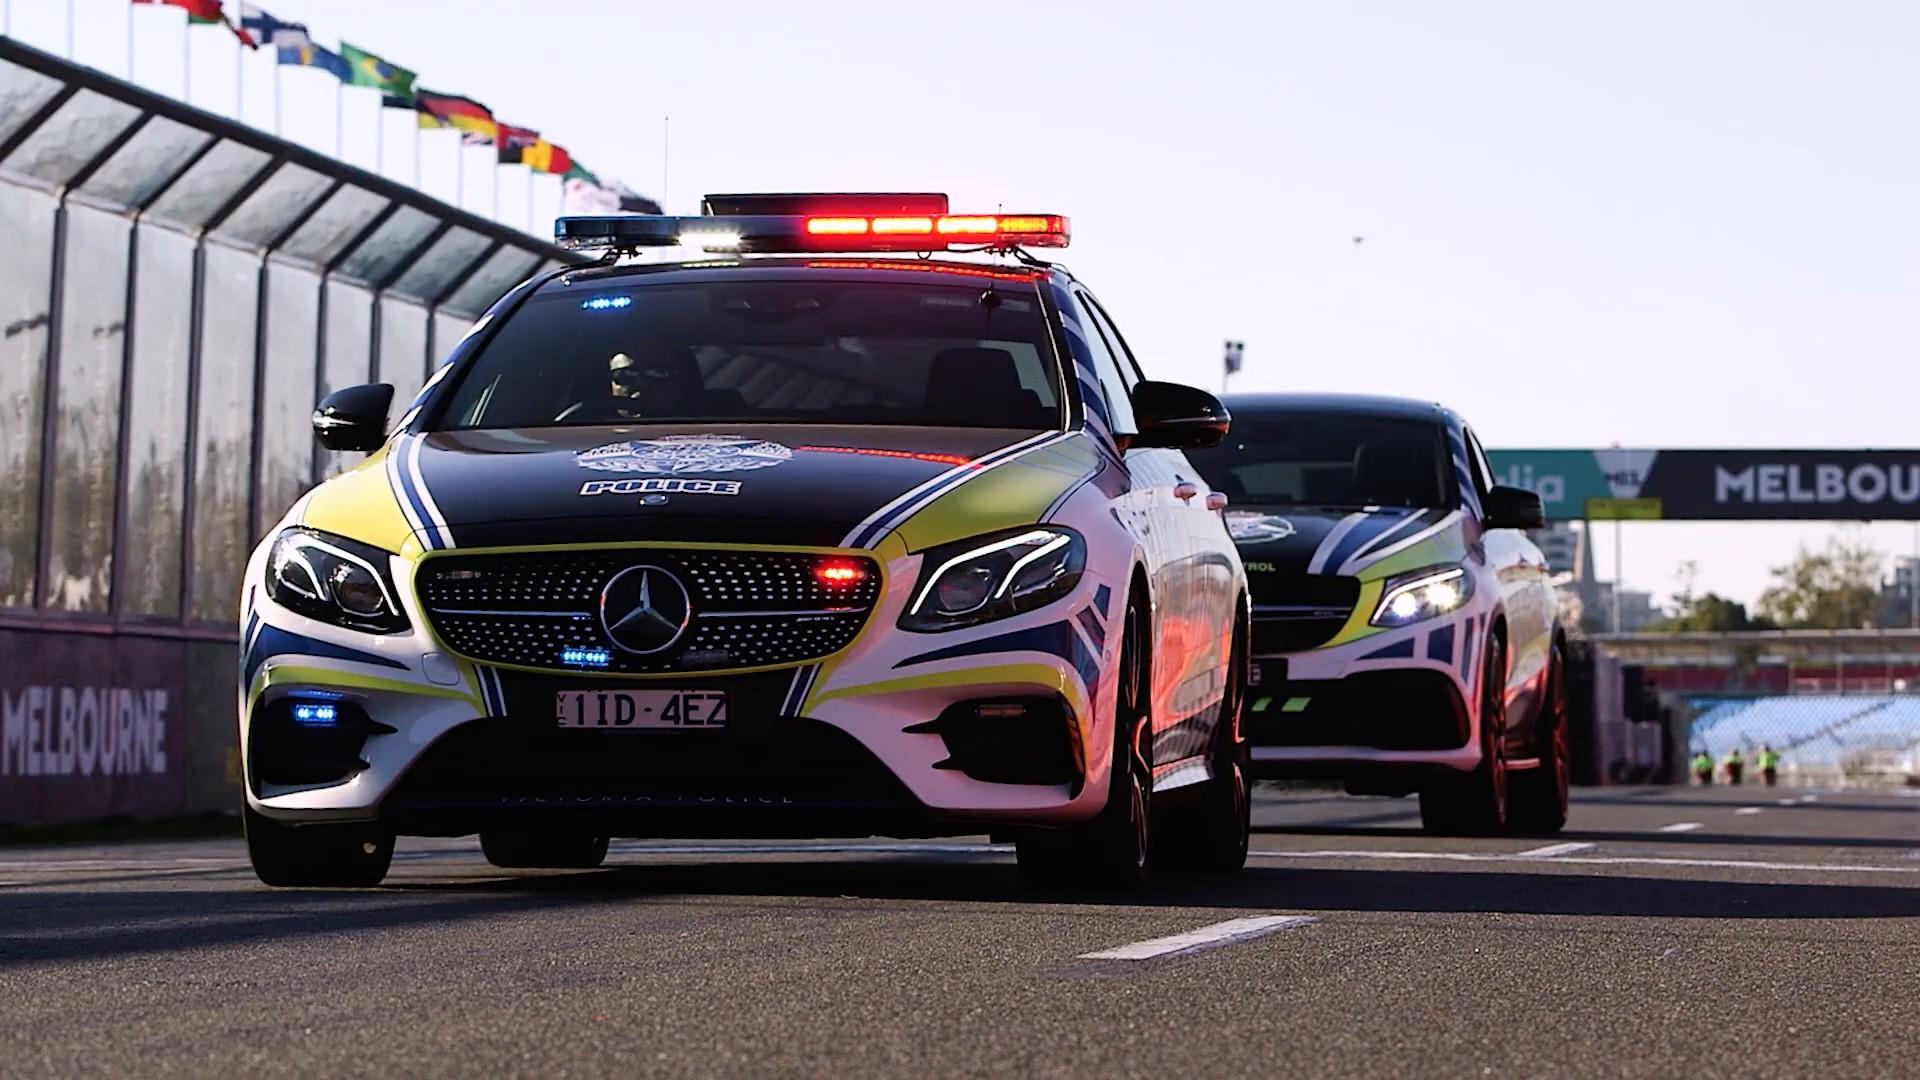 Dubai Police Supercars Explained: The Full Story ...